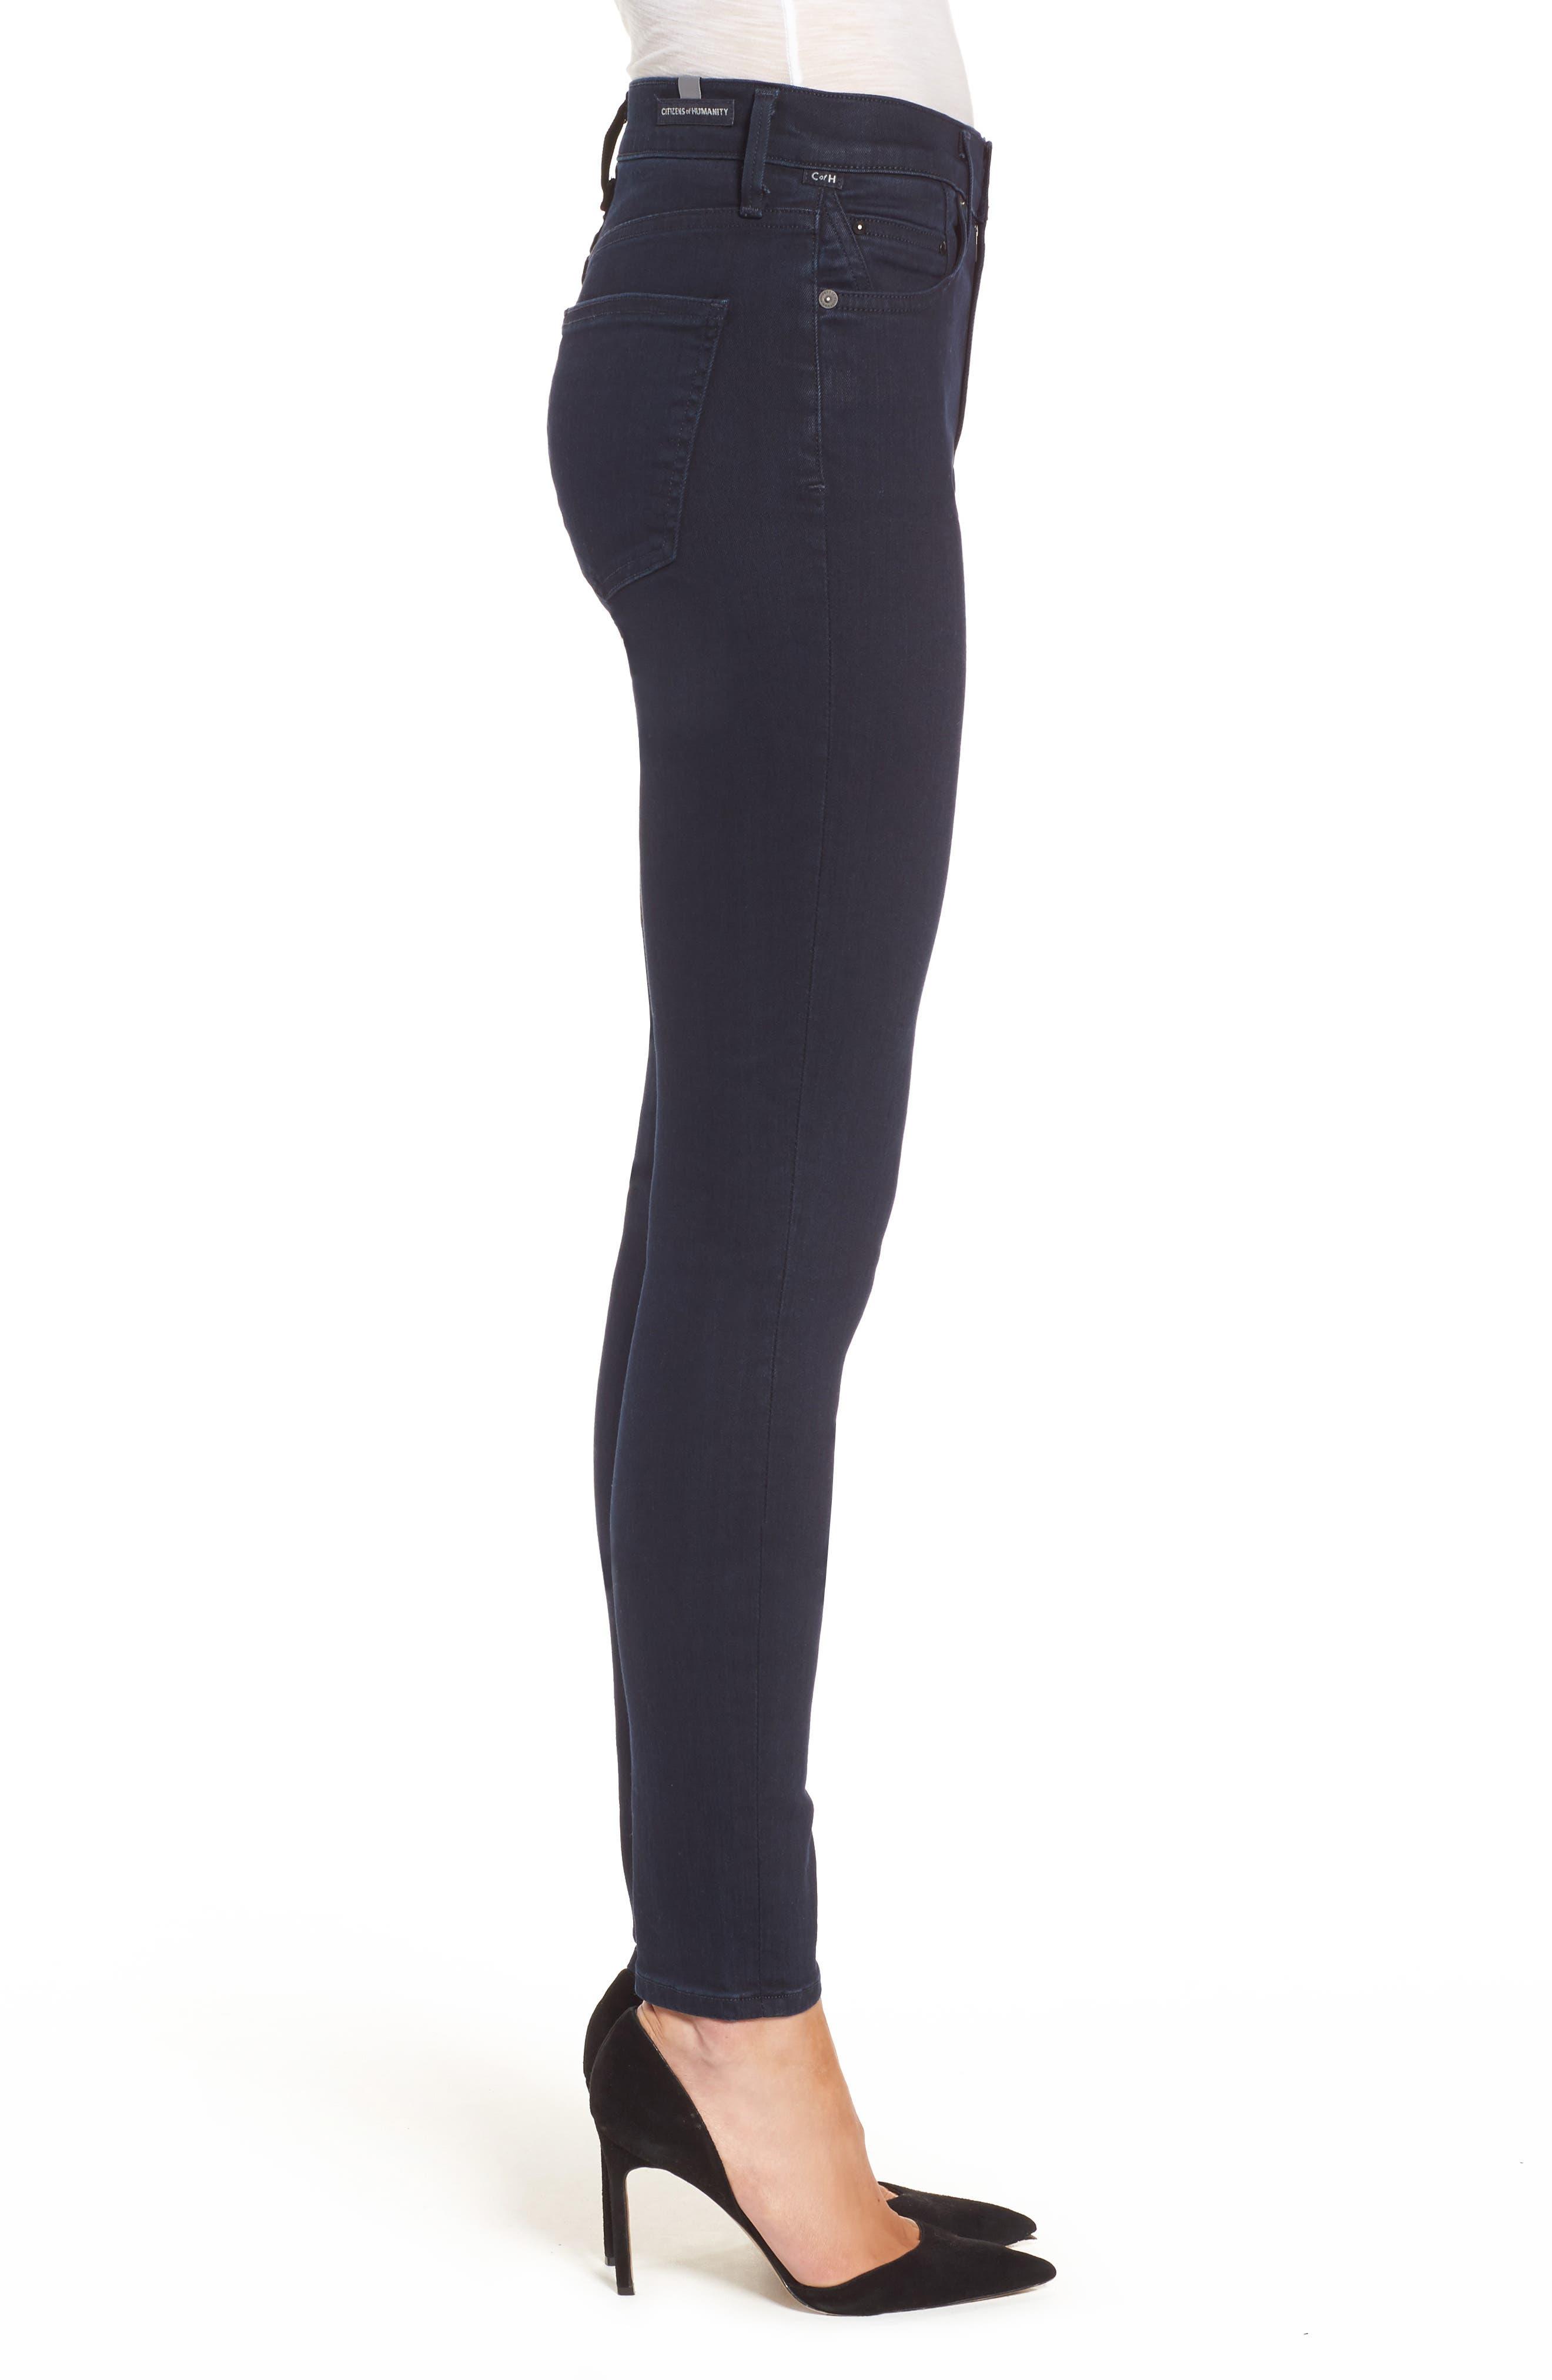 Rocket High Waist Skinny Jeans,                             Alternate thumbnail 3, color,                             Ozone Ink